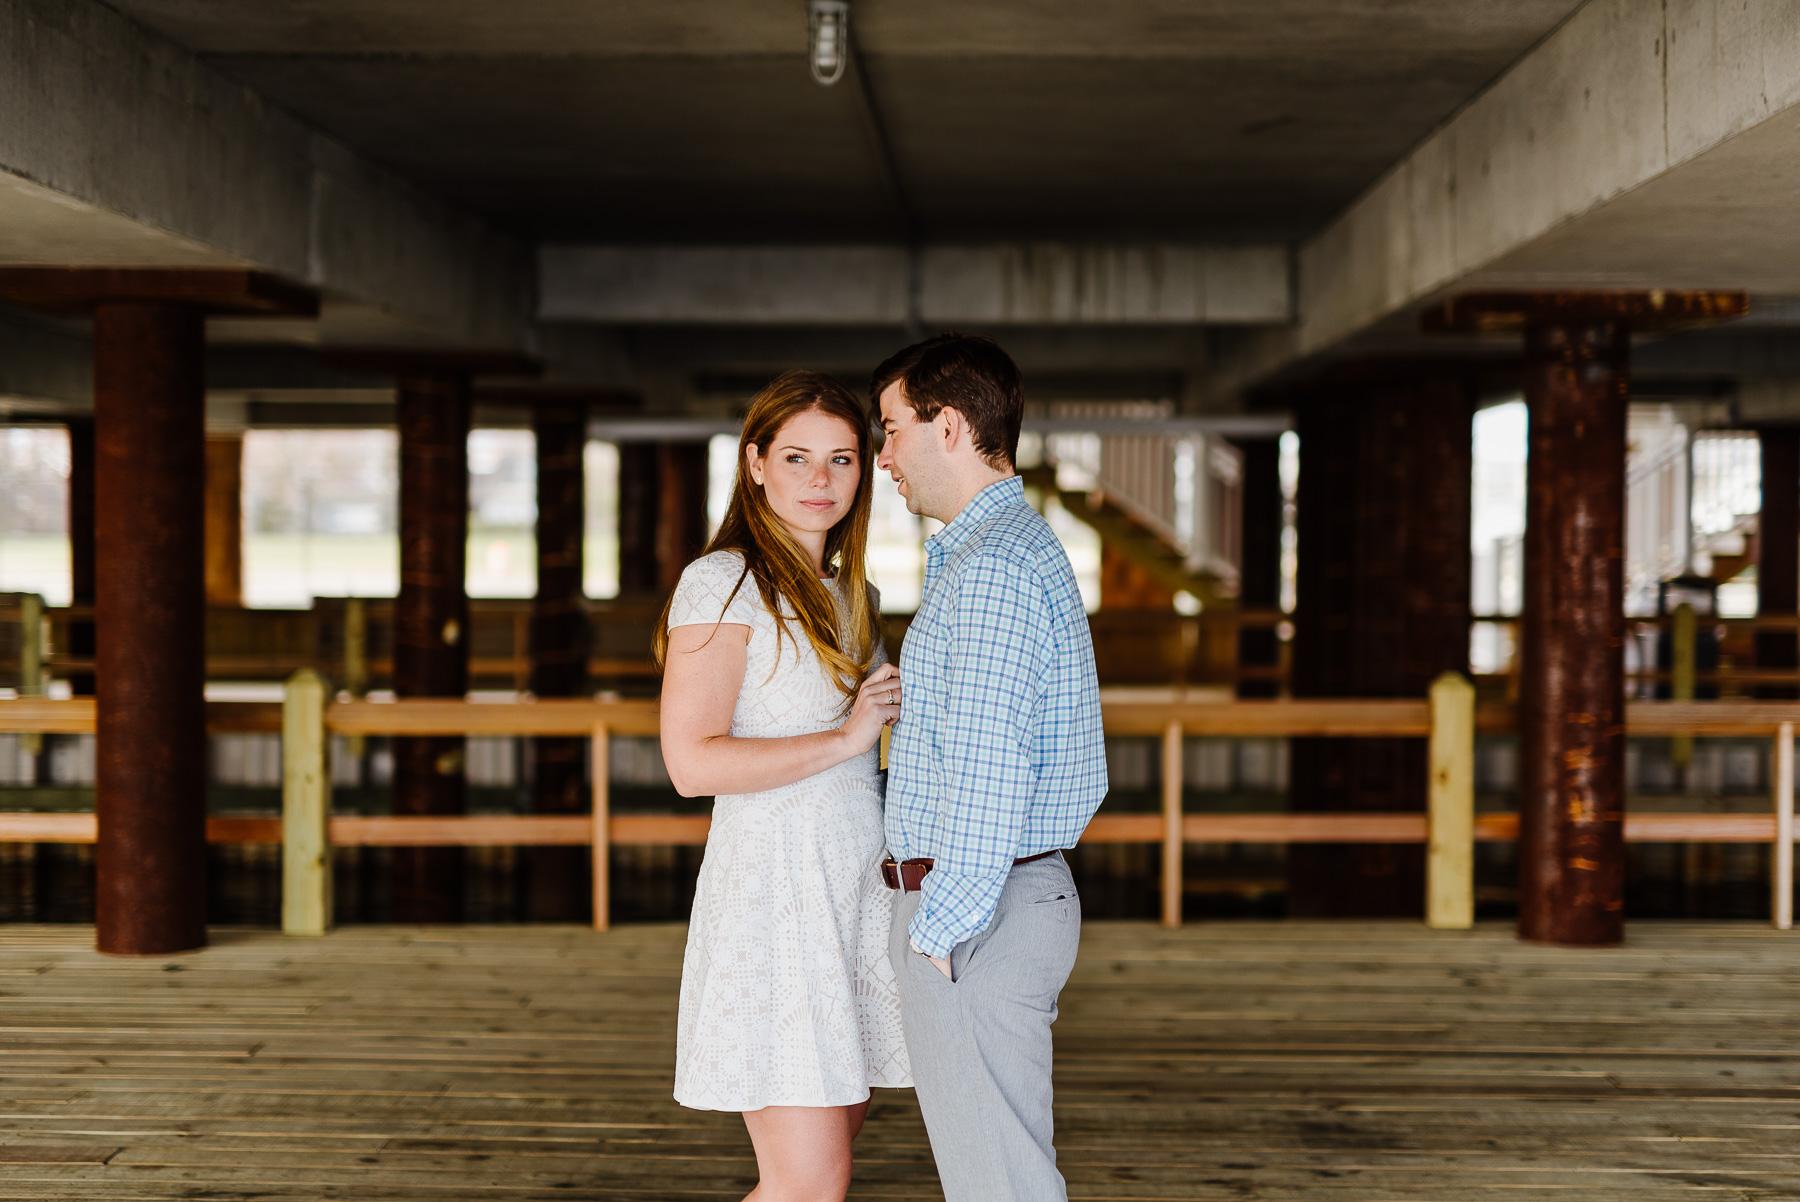 42-Bay Head NJ Engagement New Jersery Engagement Photographer NYC Engagements Brooklyn Engagement Photos Longbrook Photography.jpg